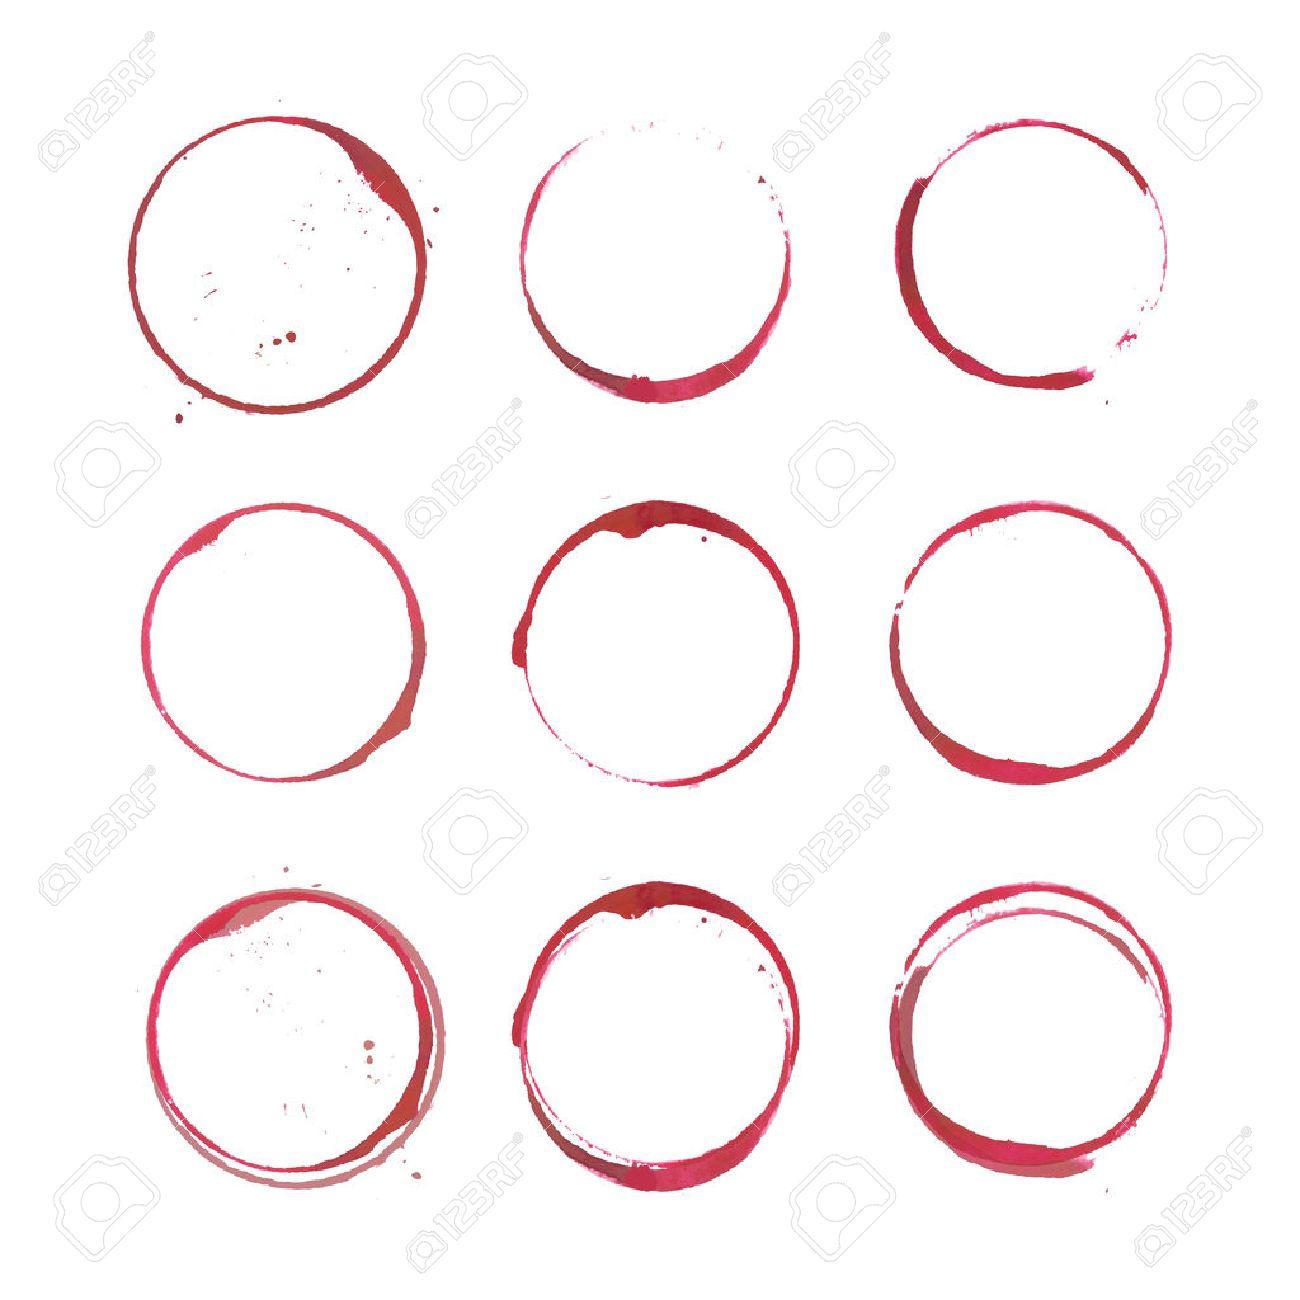 Wine stain circles - 39543841